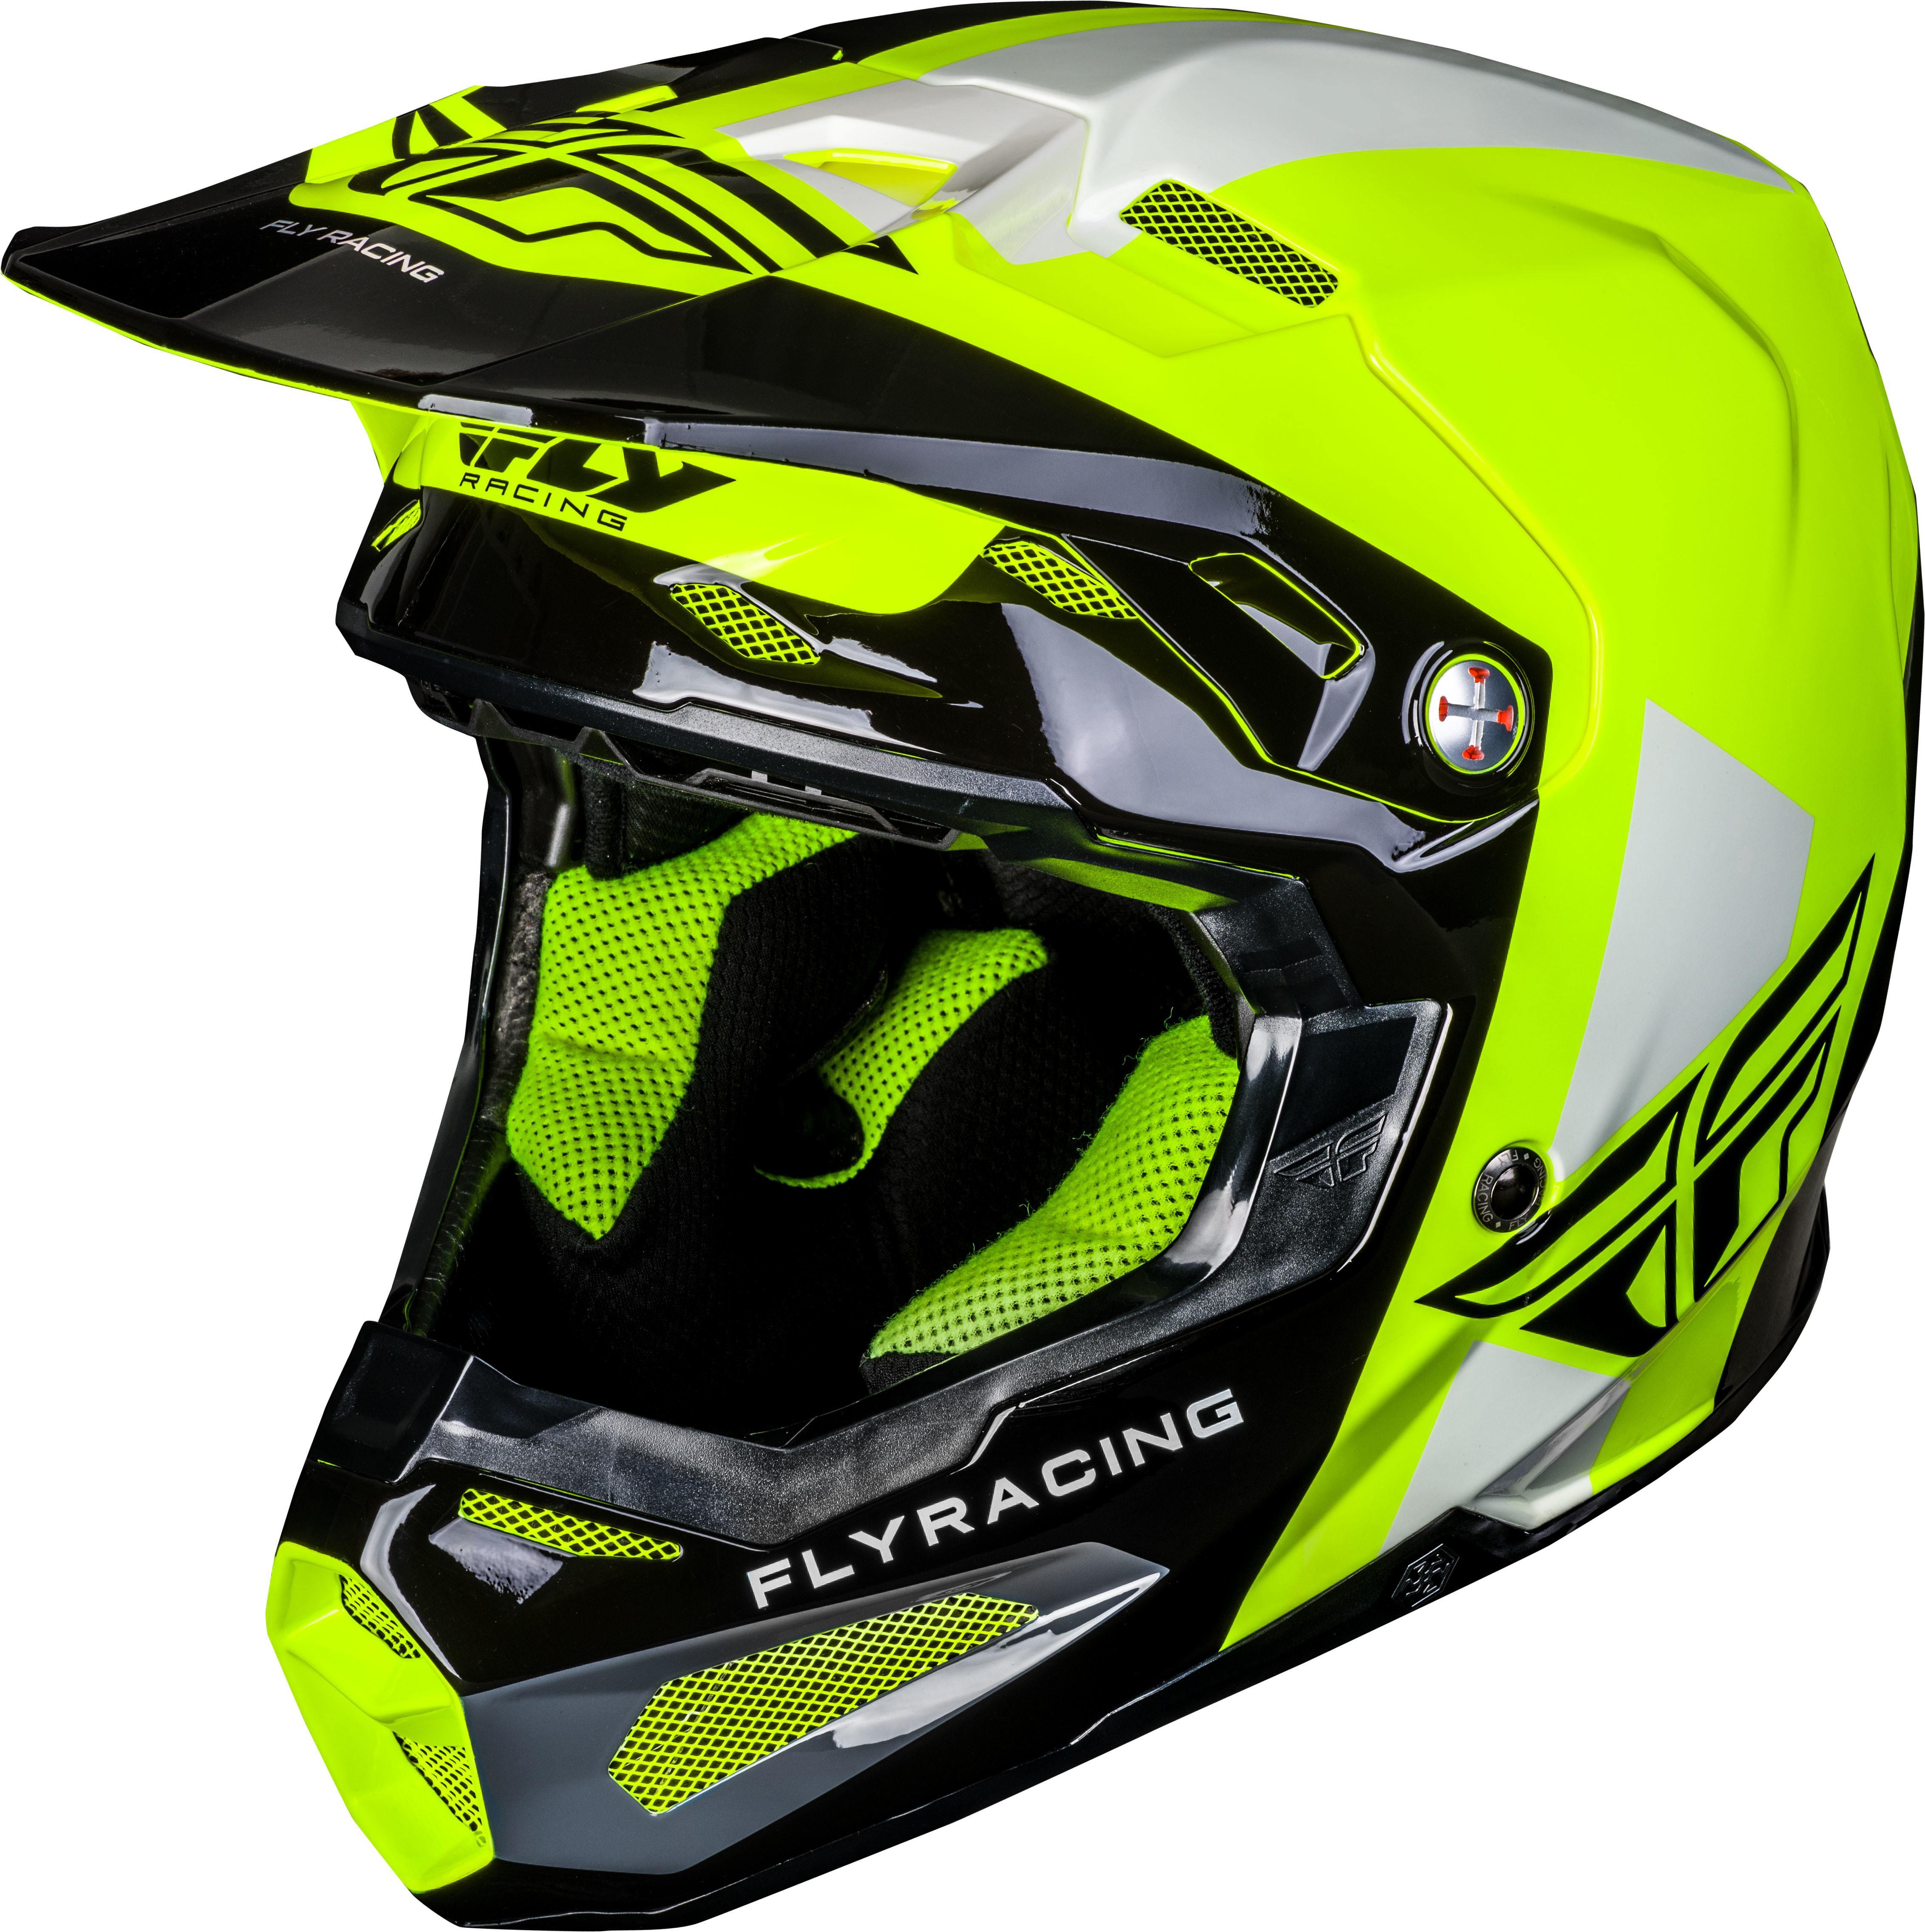 FORMULA ORIGIN Helmet Black Hi-Vis,  Md  73-4406M